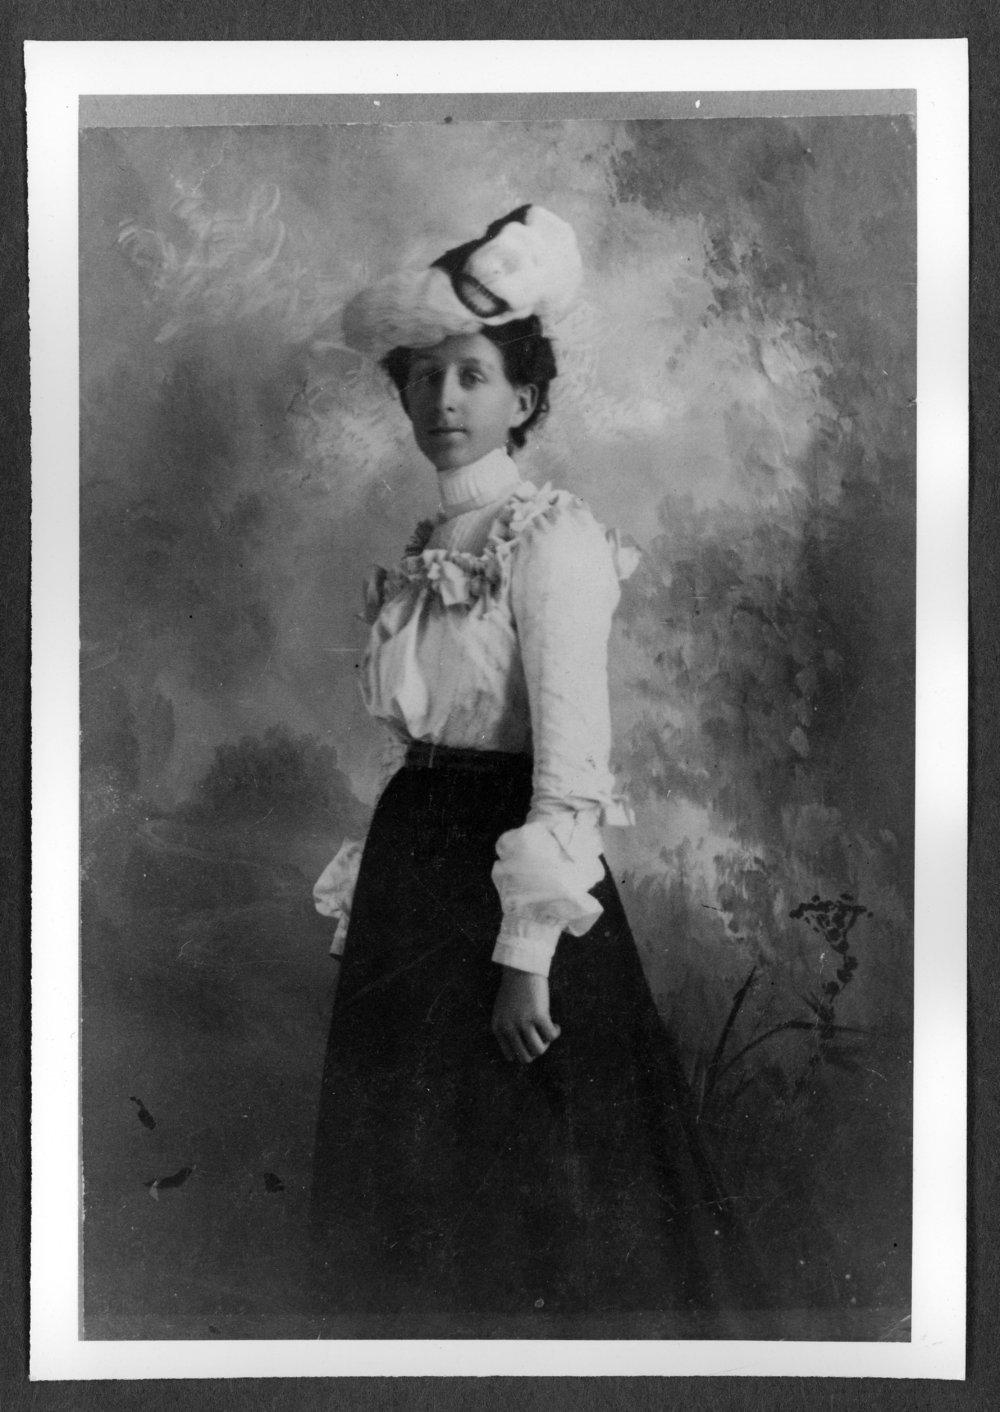 Scenes of Sherman County, Kansas - Cecilia Viselik of Ruleton, Kansas.